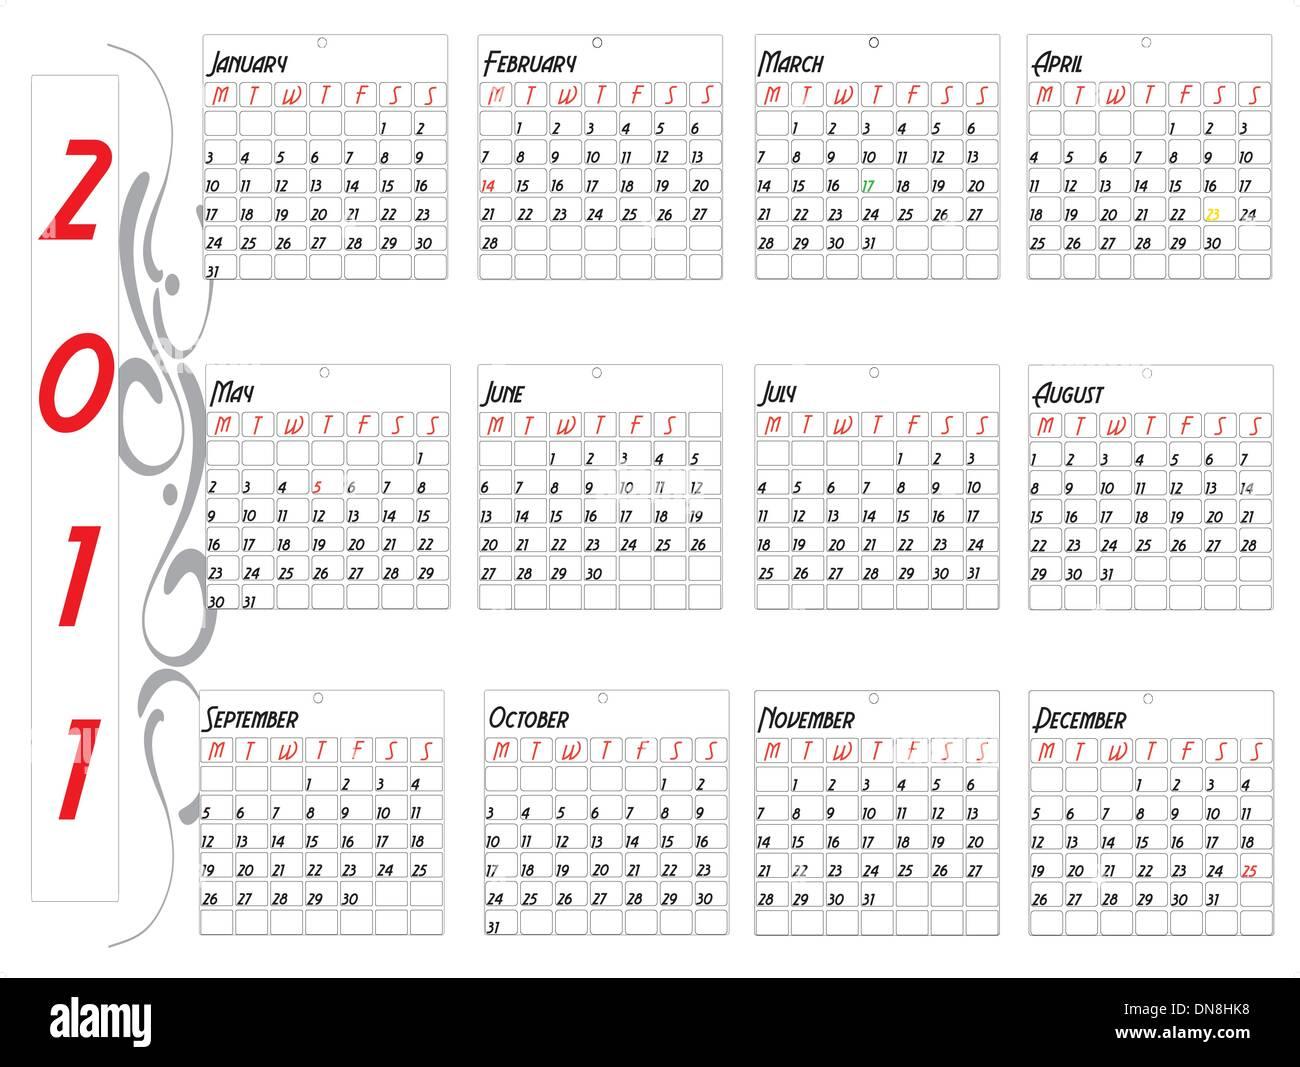 12 month calendar stock photos 12 month calendar stock images alamy